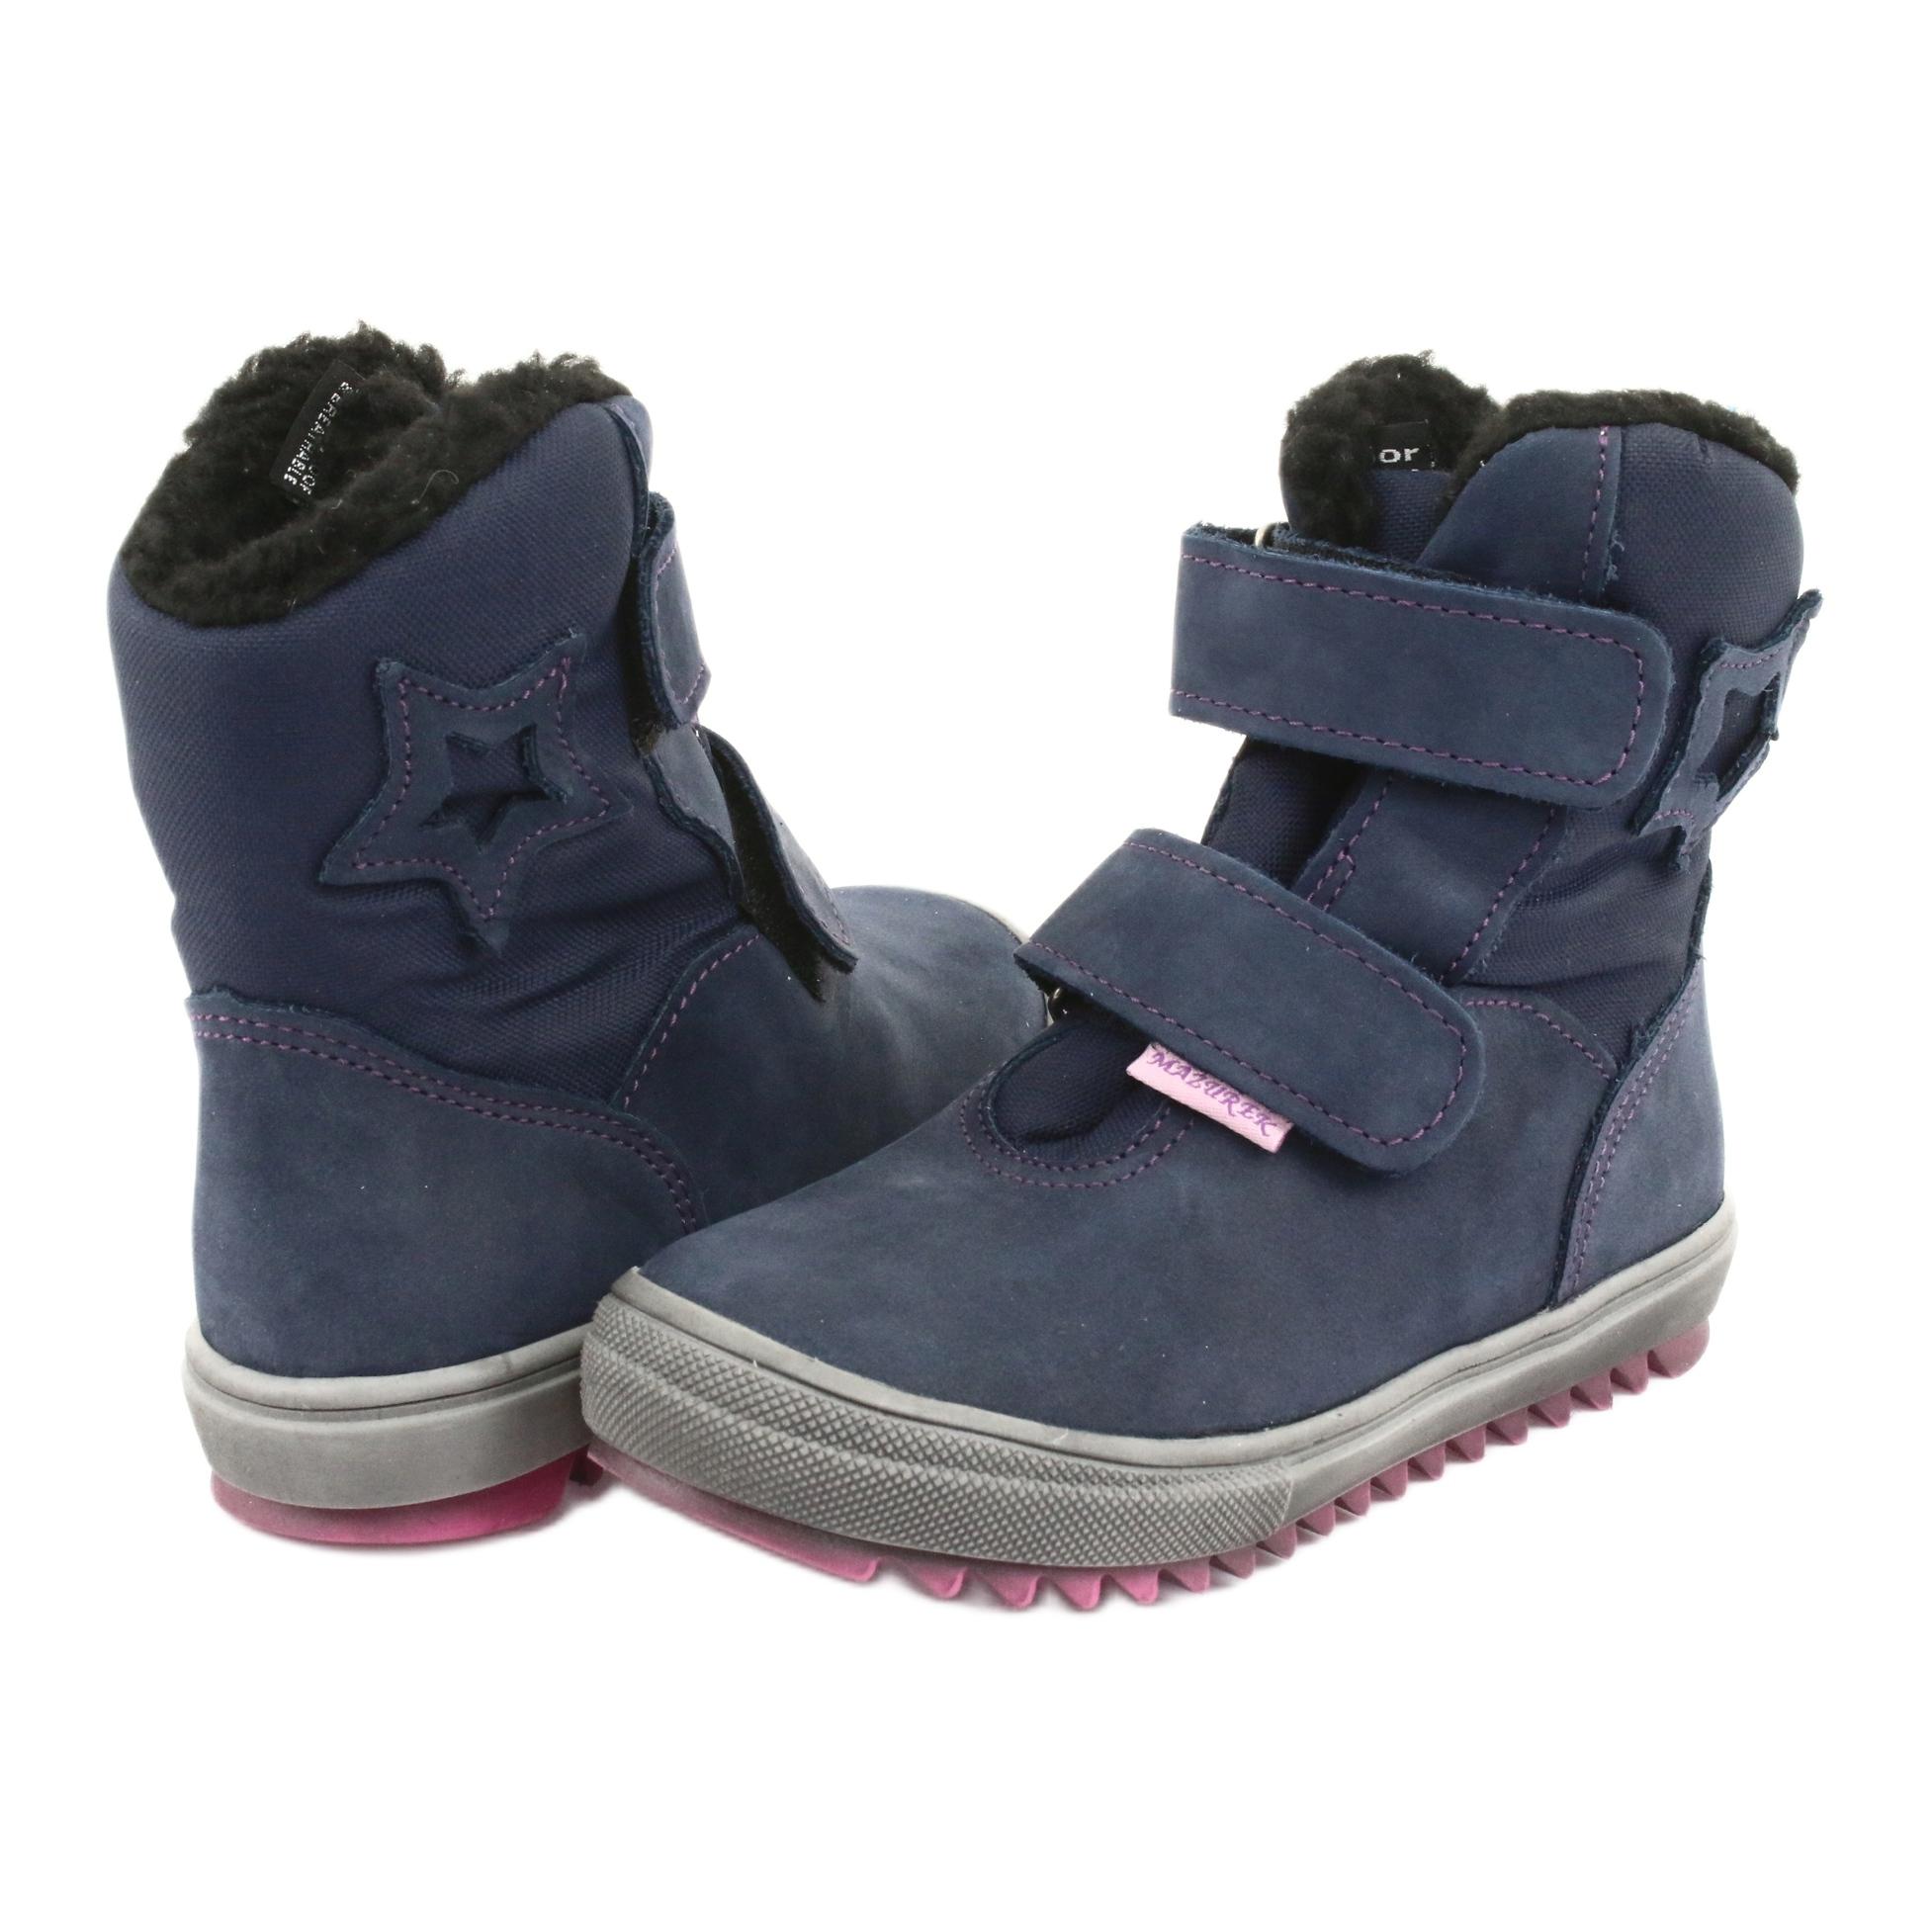 miniatura 4 - Stivali con una membrana Mazurek 1353 blu scuro marina rosa